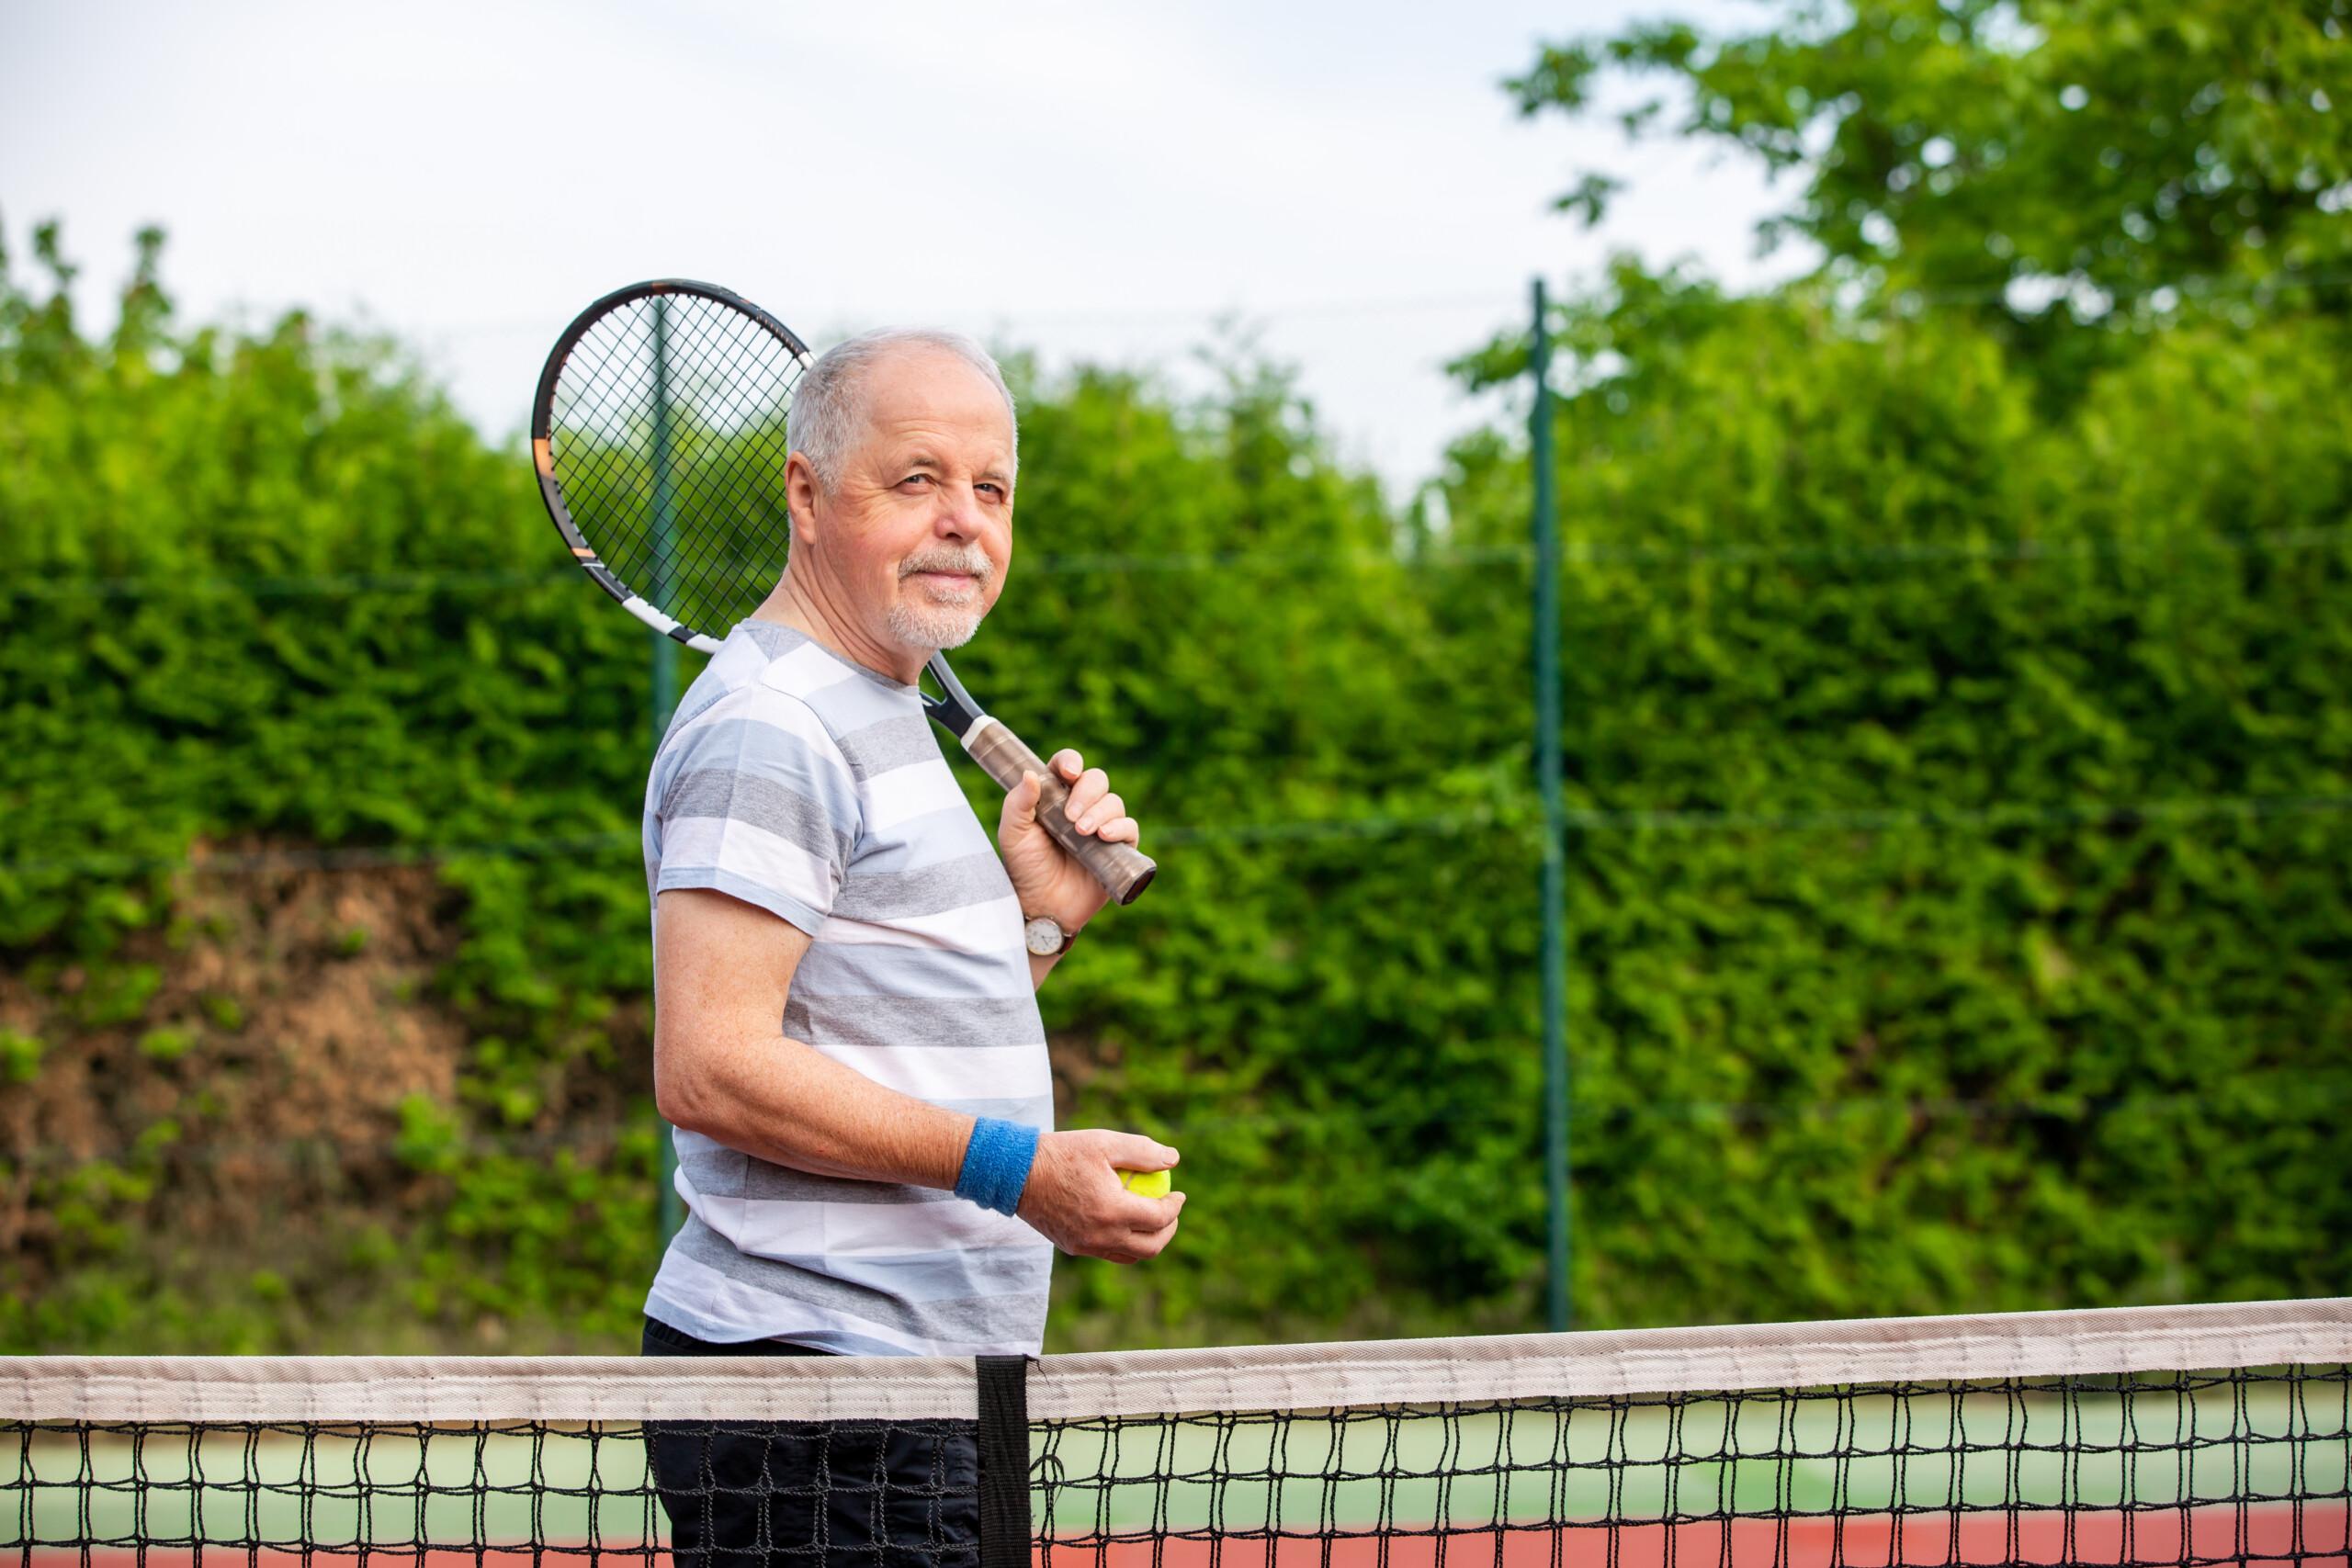 Portrait of senior man before his tennis match, sport concept